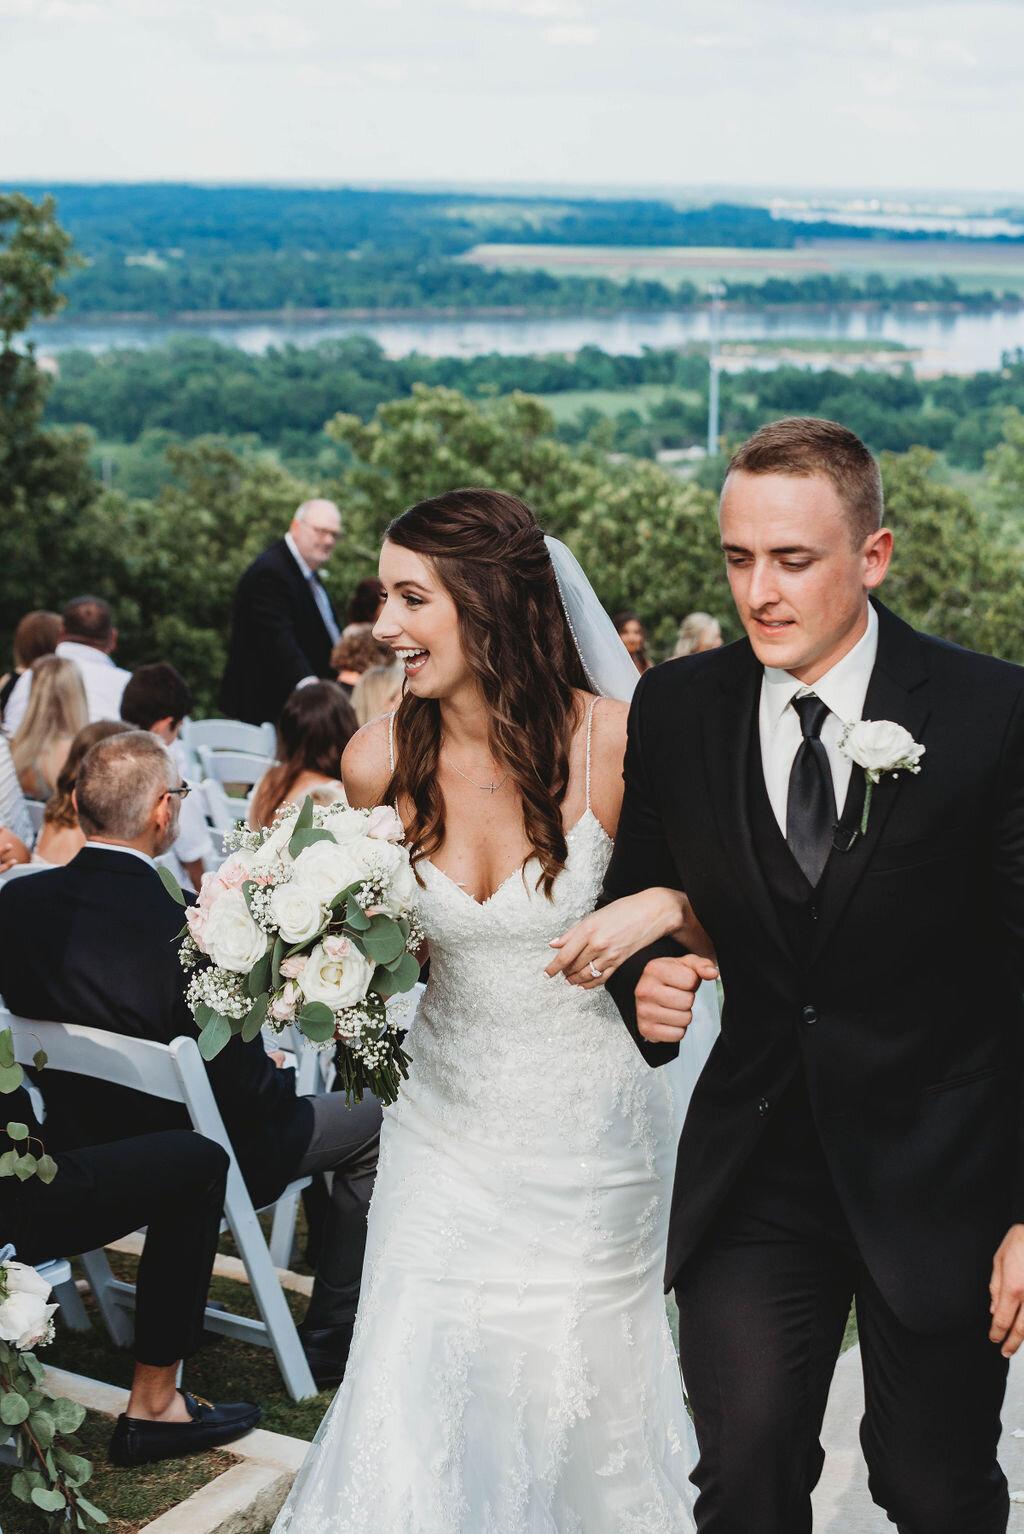 Tulsa Wedding Venue with a View 30.jpg